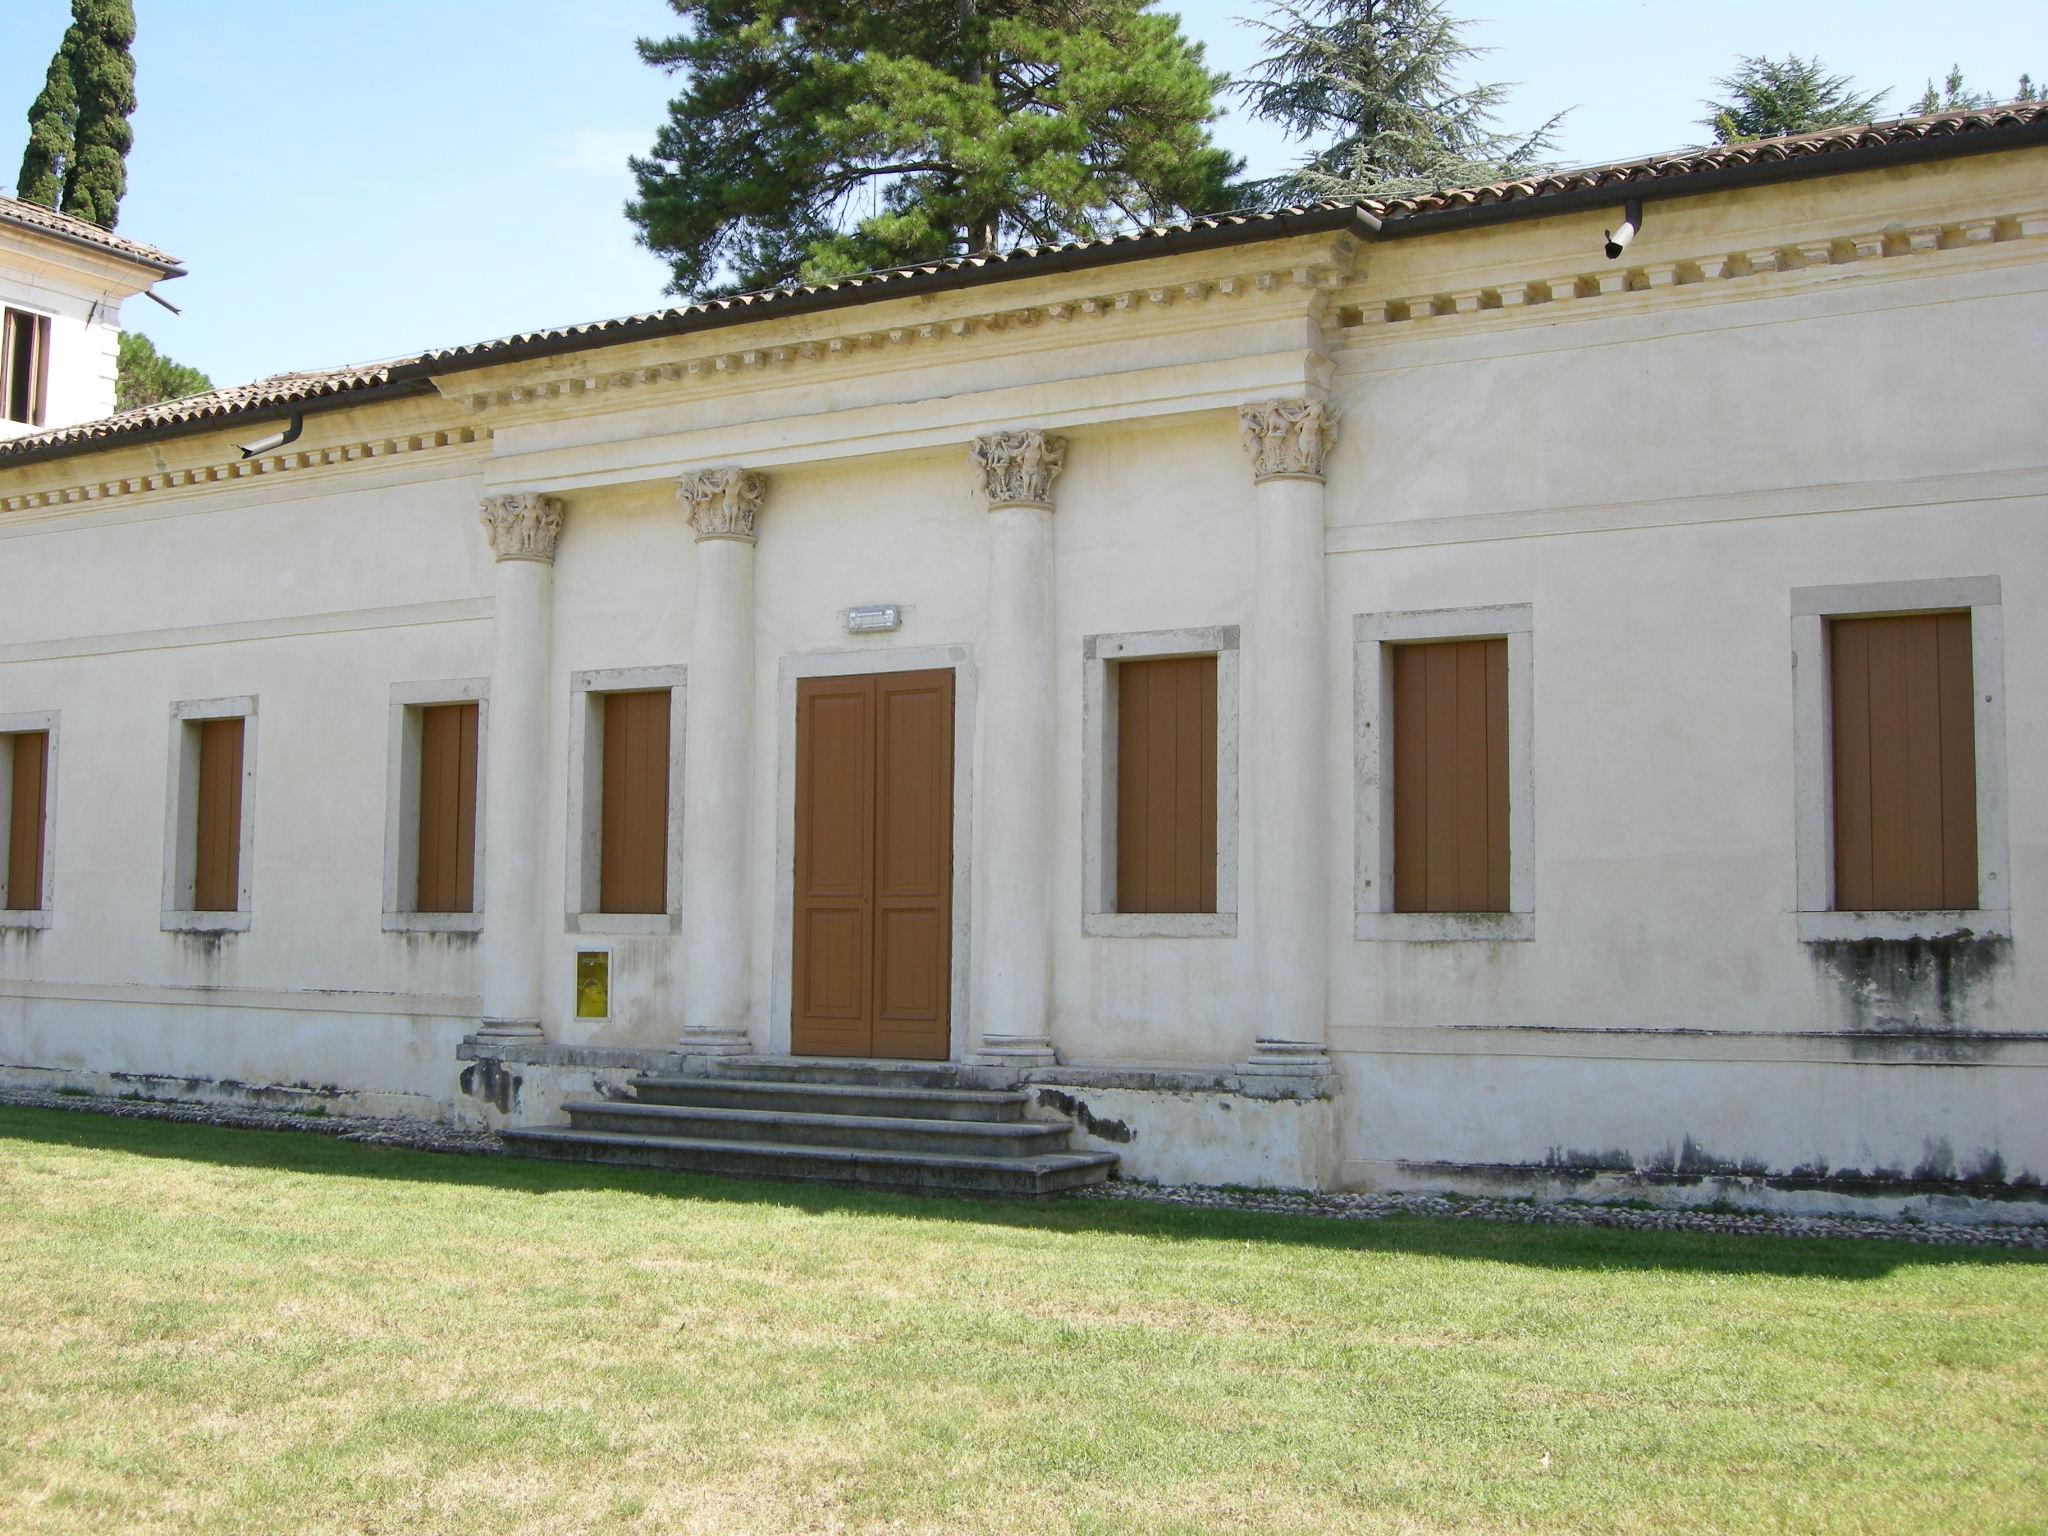 Villa Manin Parco